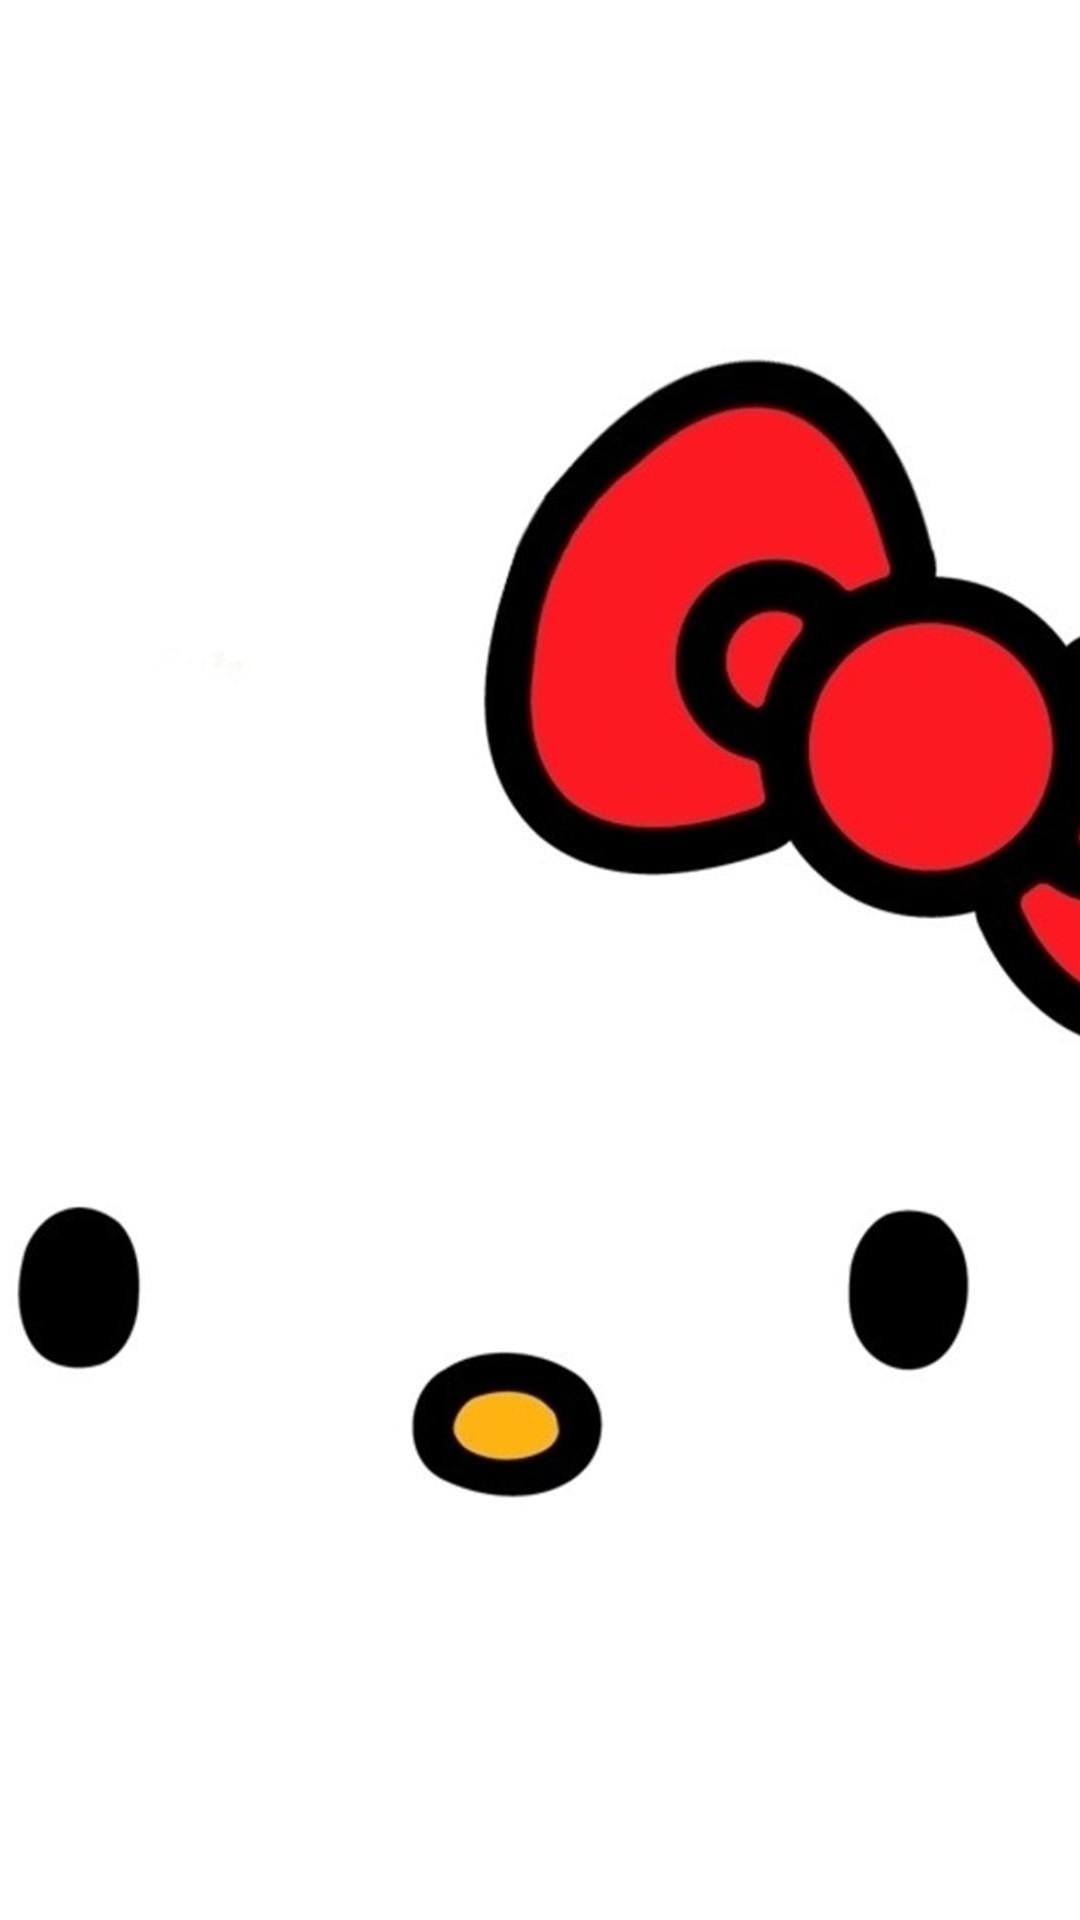 46 Hello Kitty Wallpapers For Free On Wallpapersafari